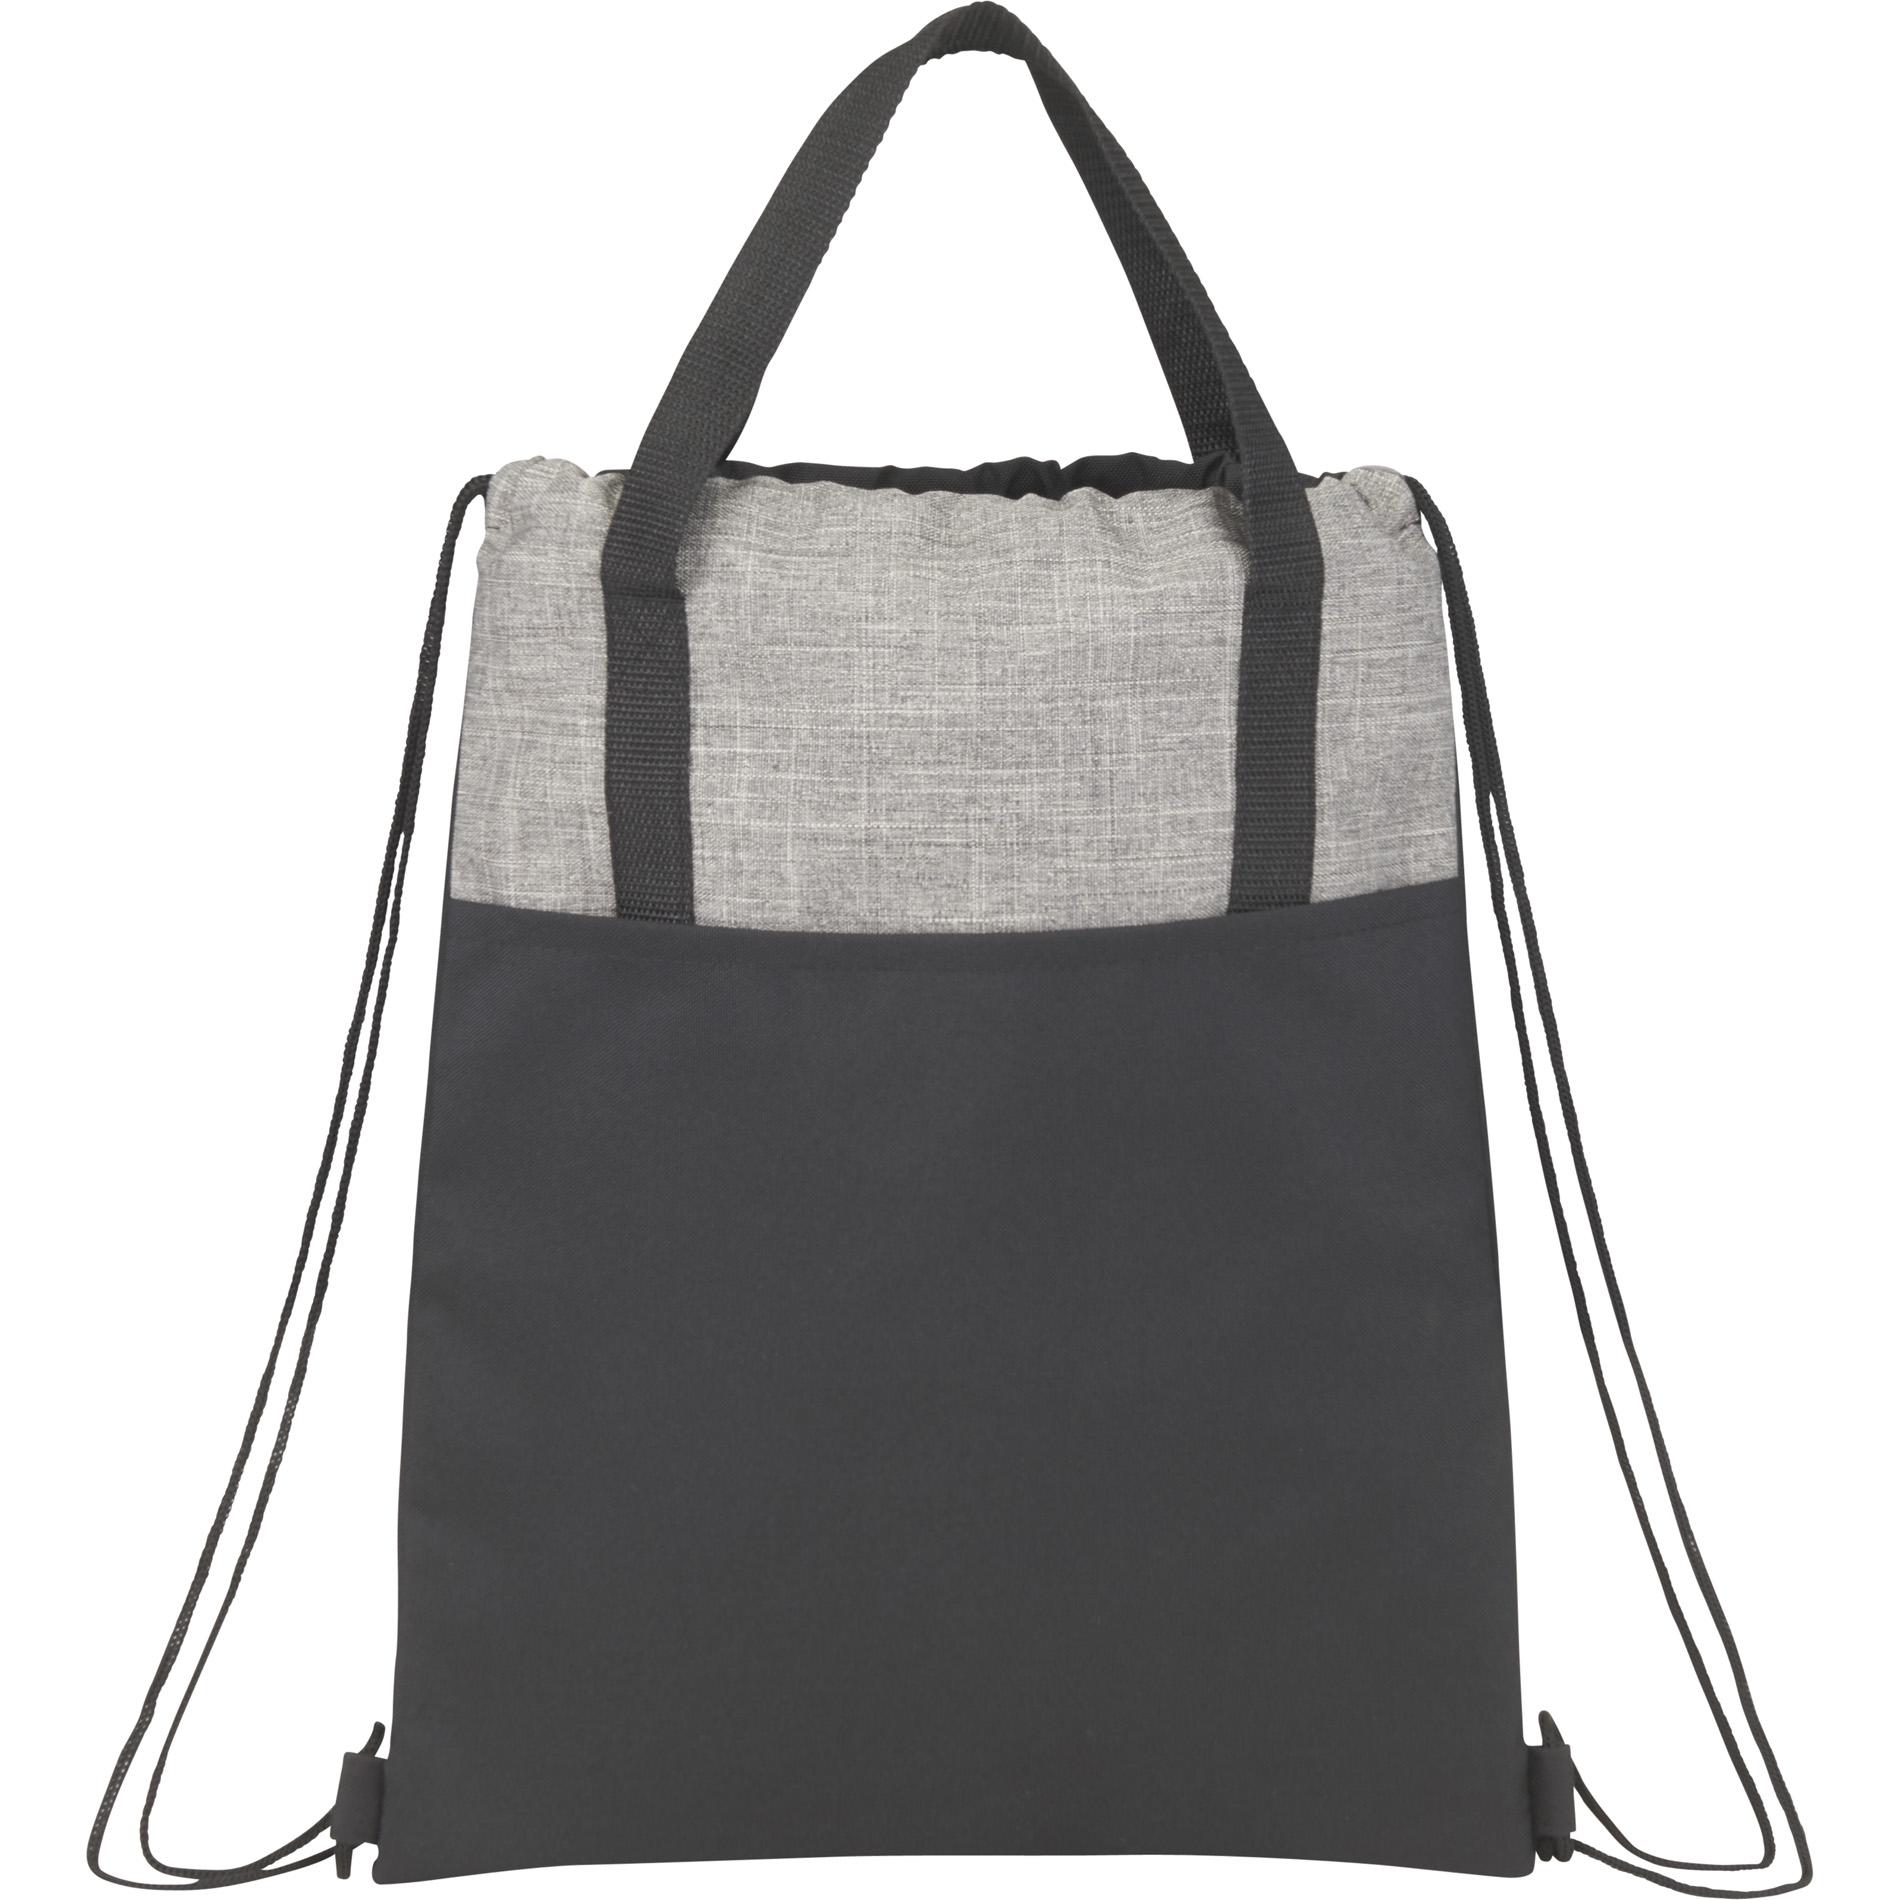 LEEDS SM-5893 - Cycle Recycled Drawstring Bag